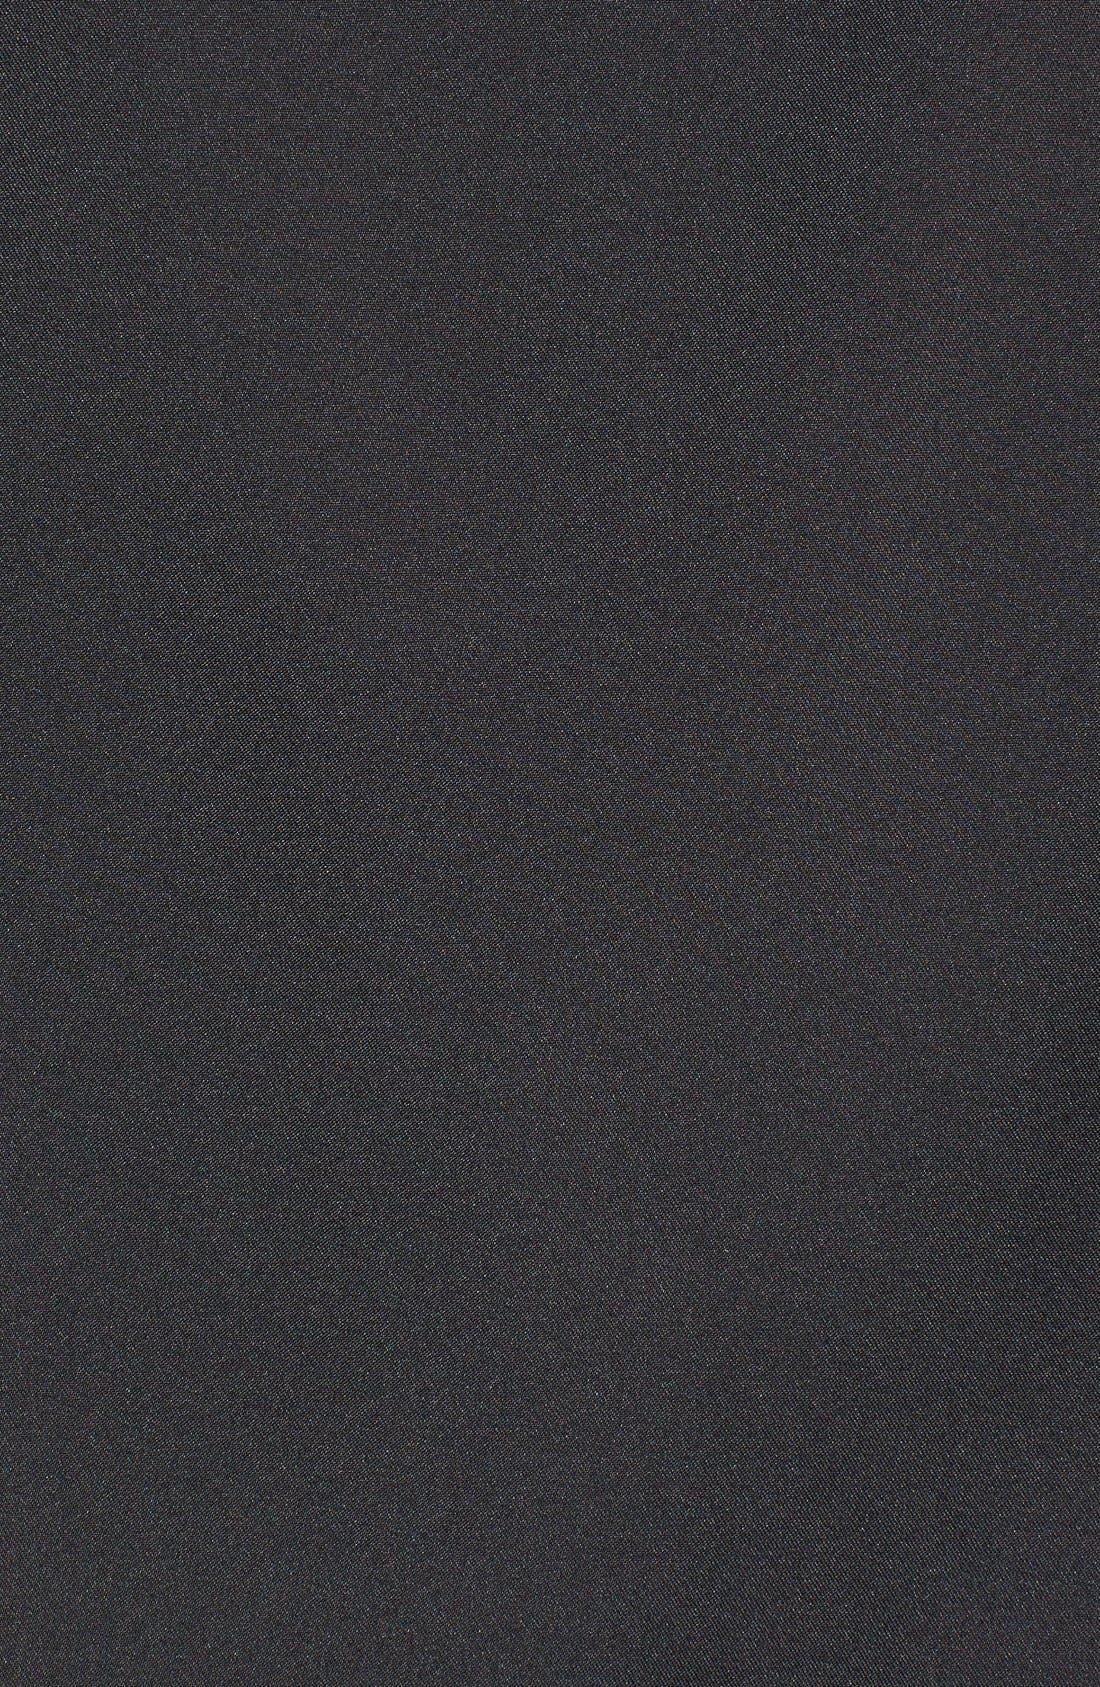 Oakland Raiders - Beacon WeatherTec Wind & Water Resistant Jacket,                             Alternate thumbnail 3, color,                             Black